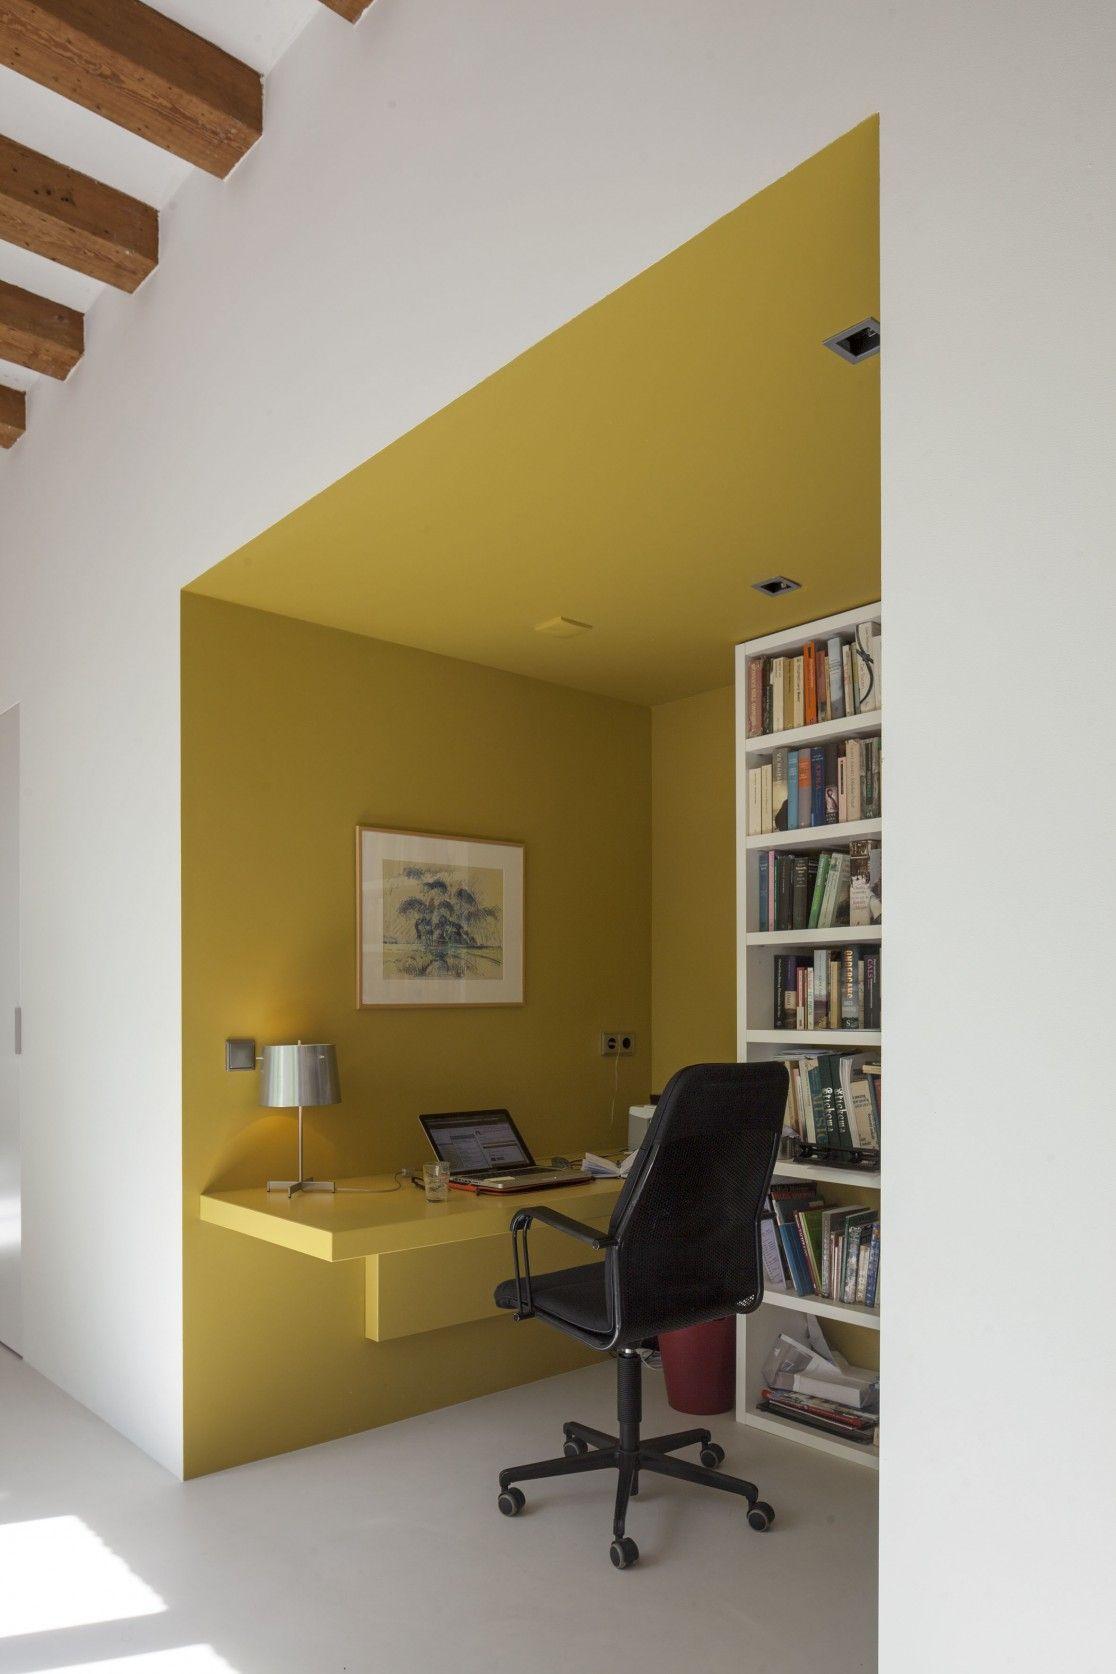 okergeel, werkplek, interieur geschutswerf. | CRAFTS | Wall Art ...